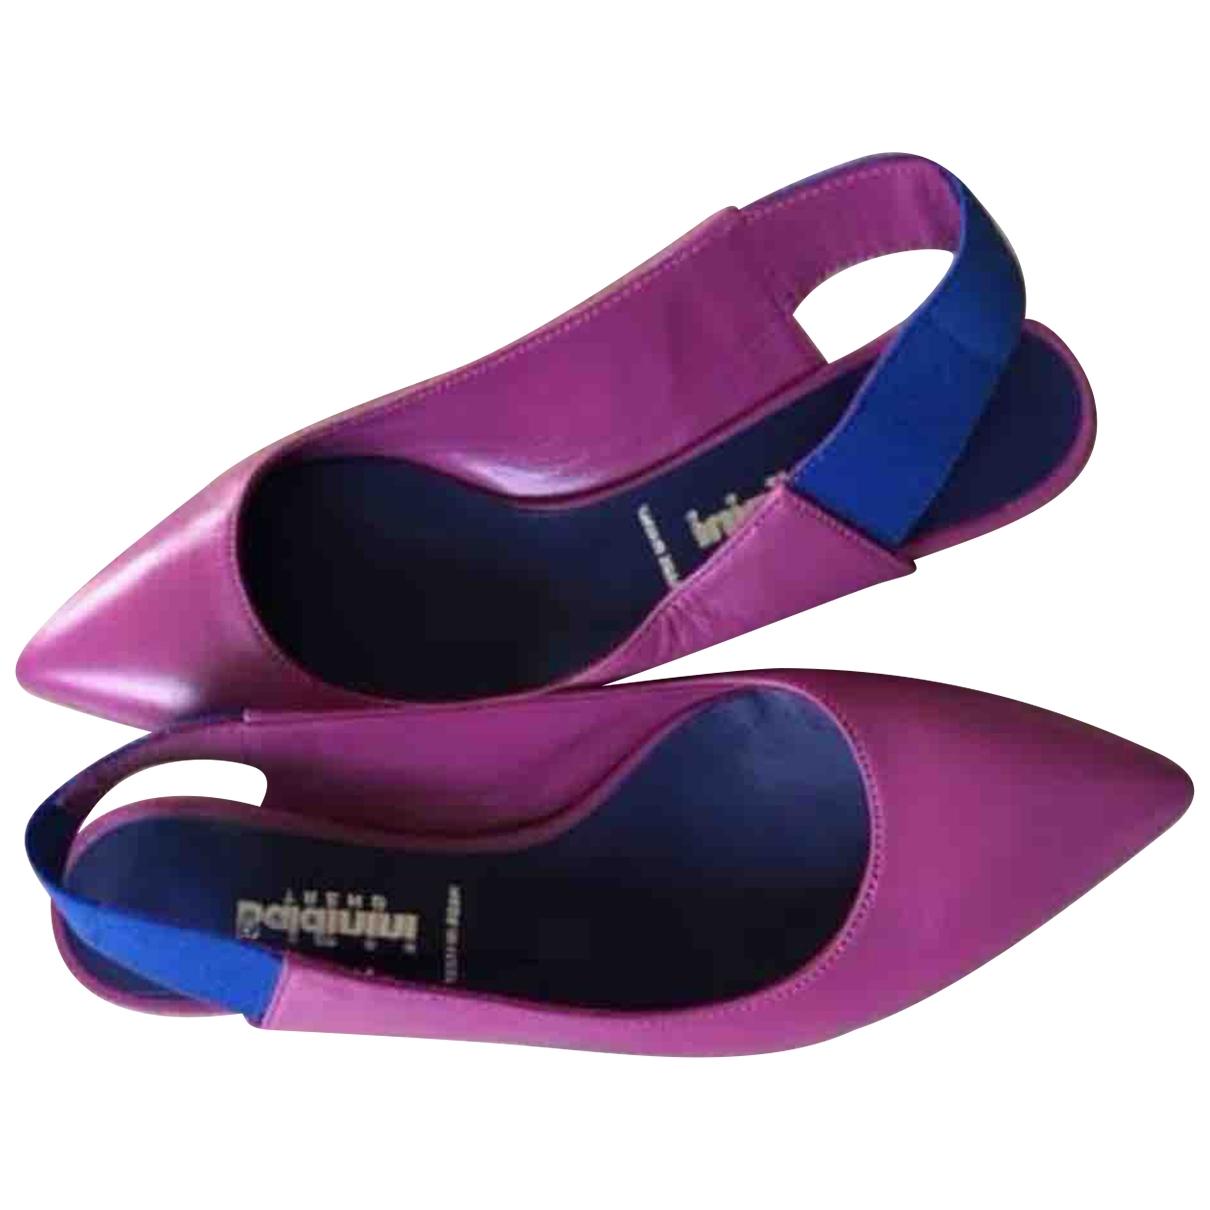 Baldinini - Ballerines   pour femme en cuir - rose